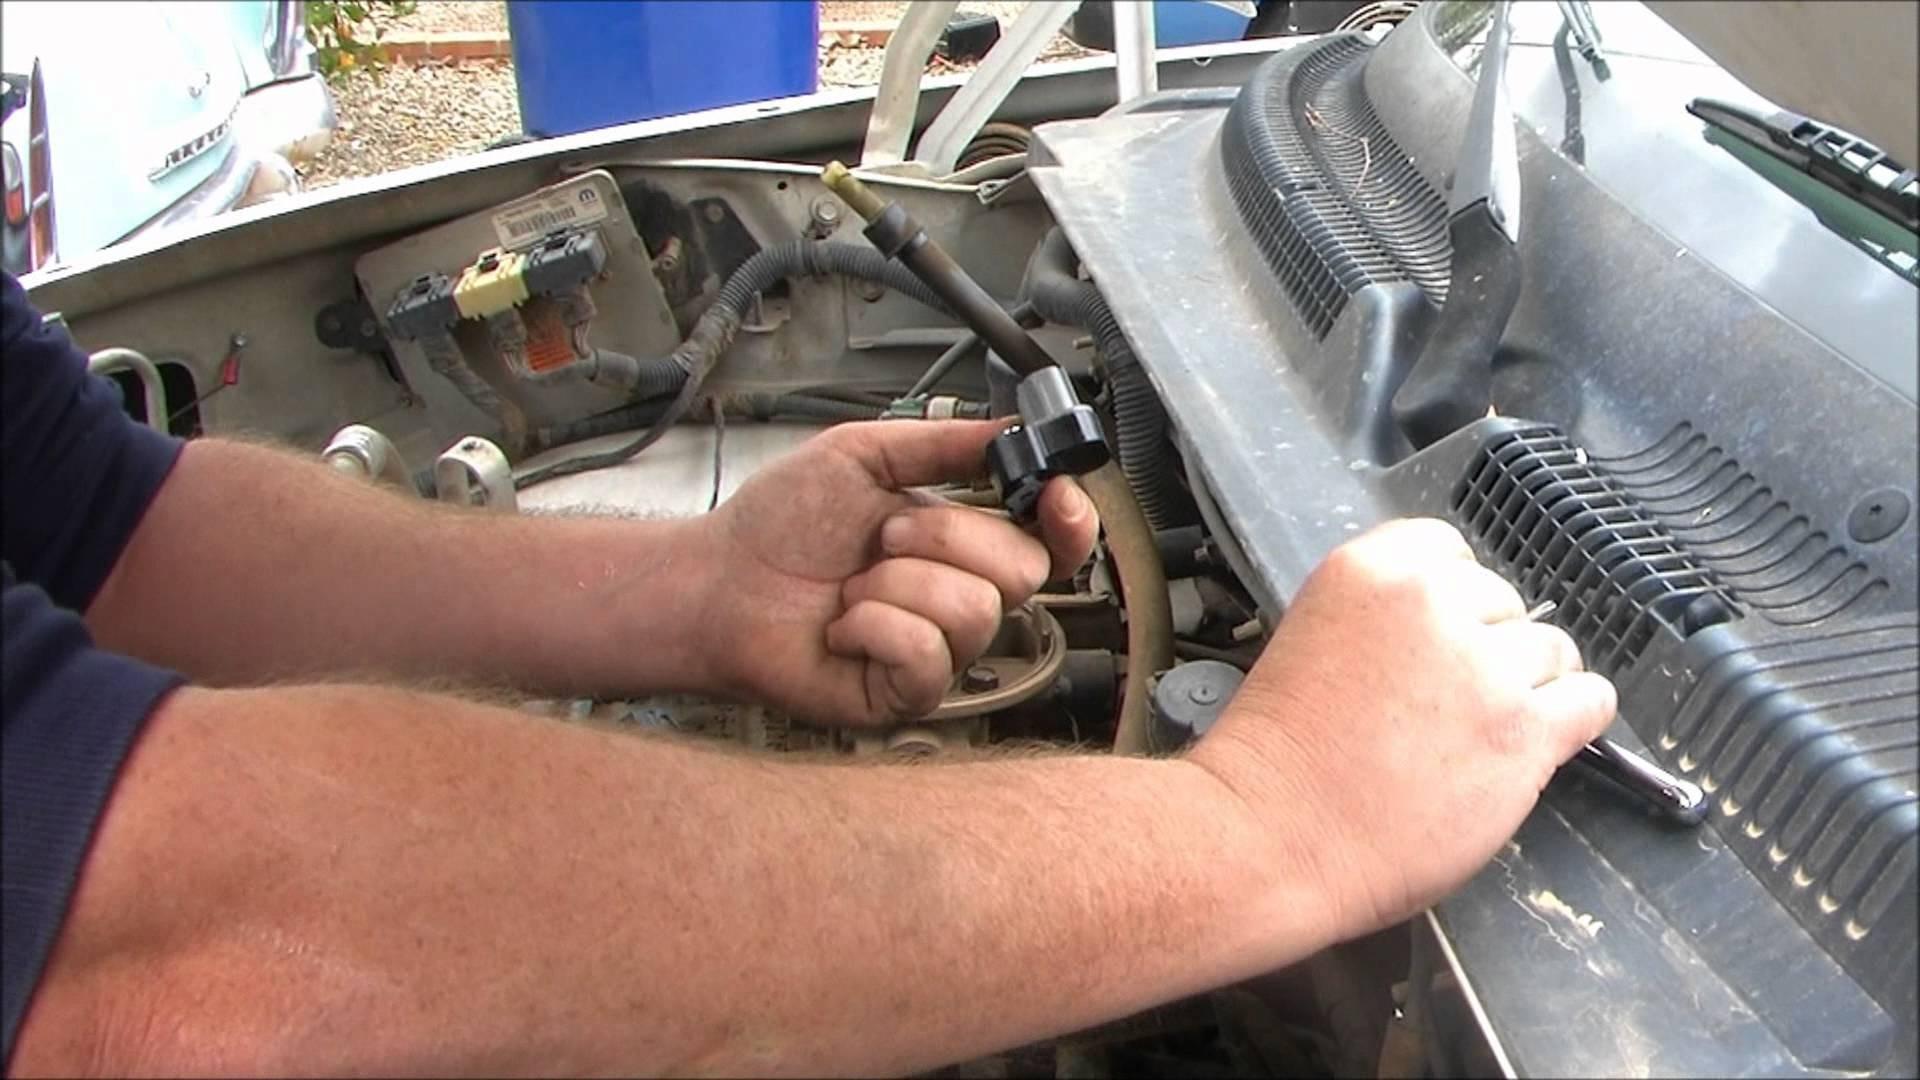 1998 Dodge Durango Fuse Box Diagram Wiring Library Jeep Engine Sensors Dakota Diagnose And Replace The Throttle Position Sensor Of